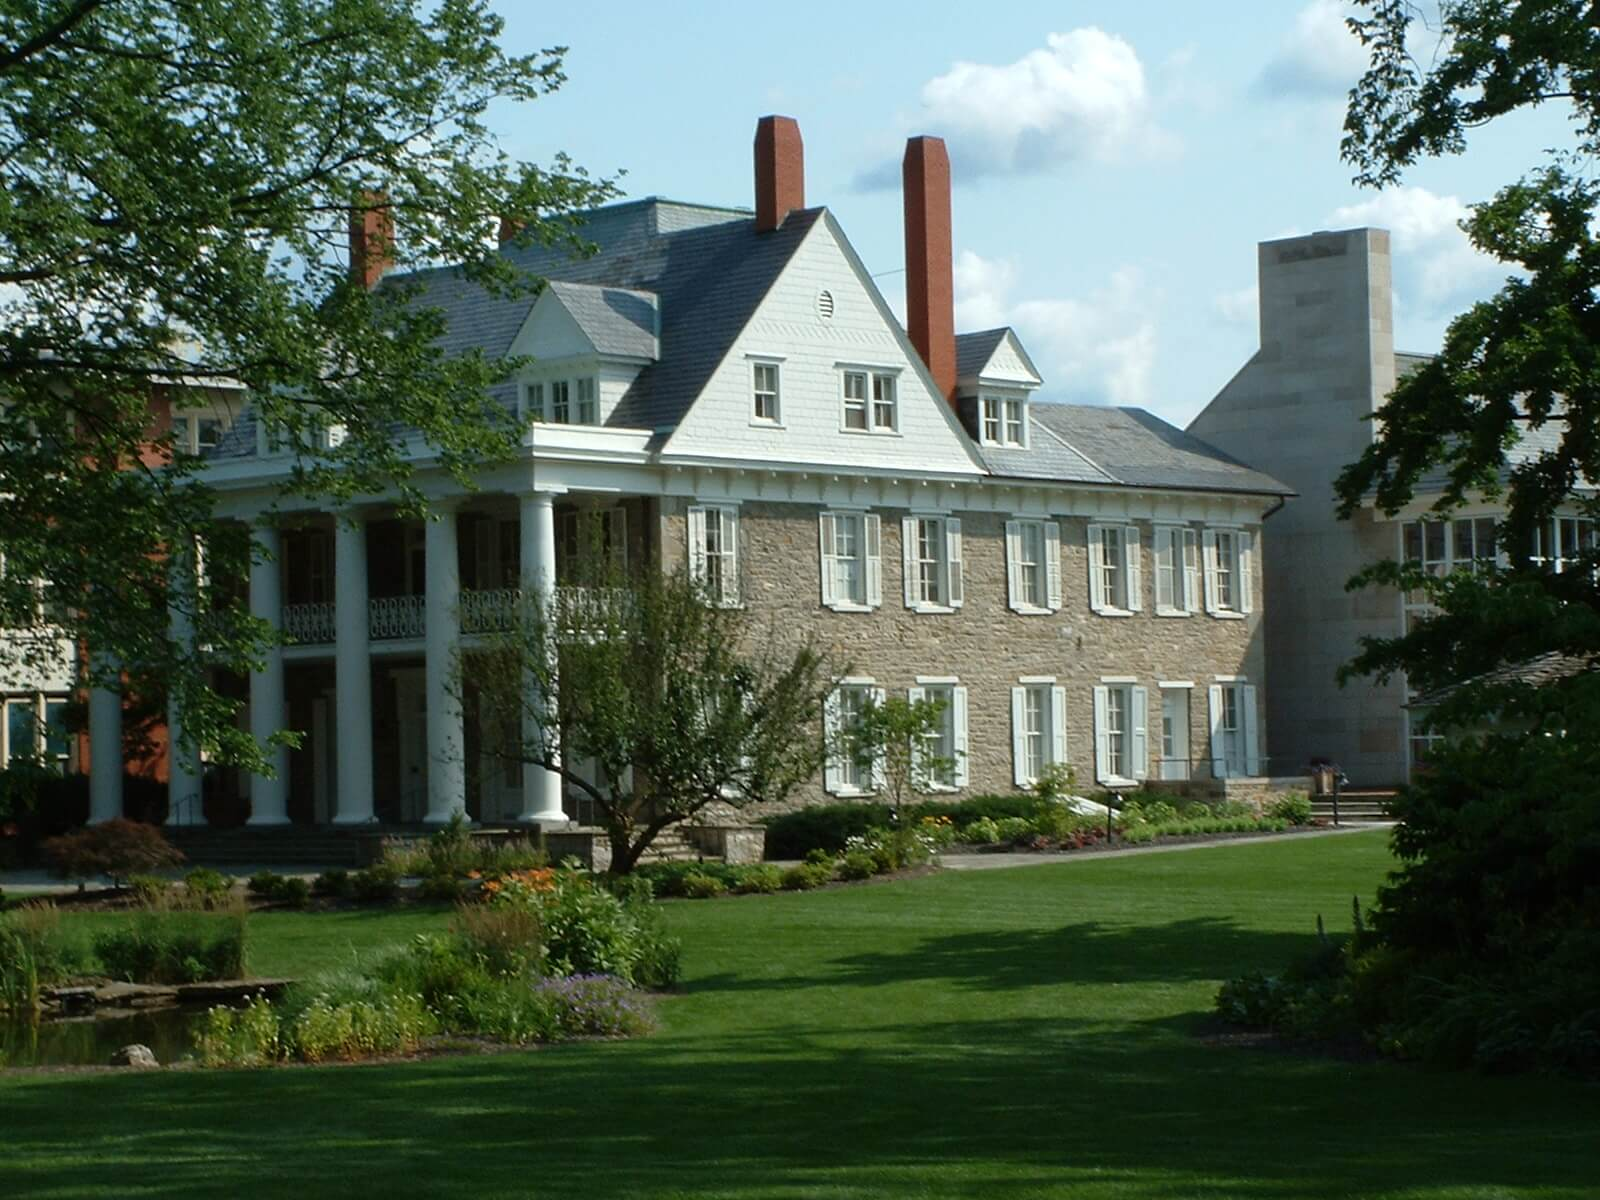 Penn State University House